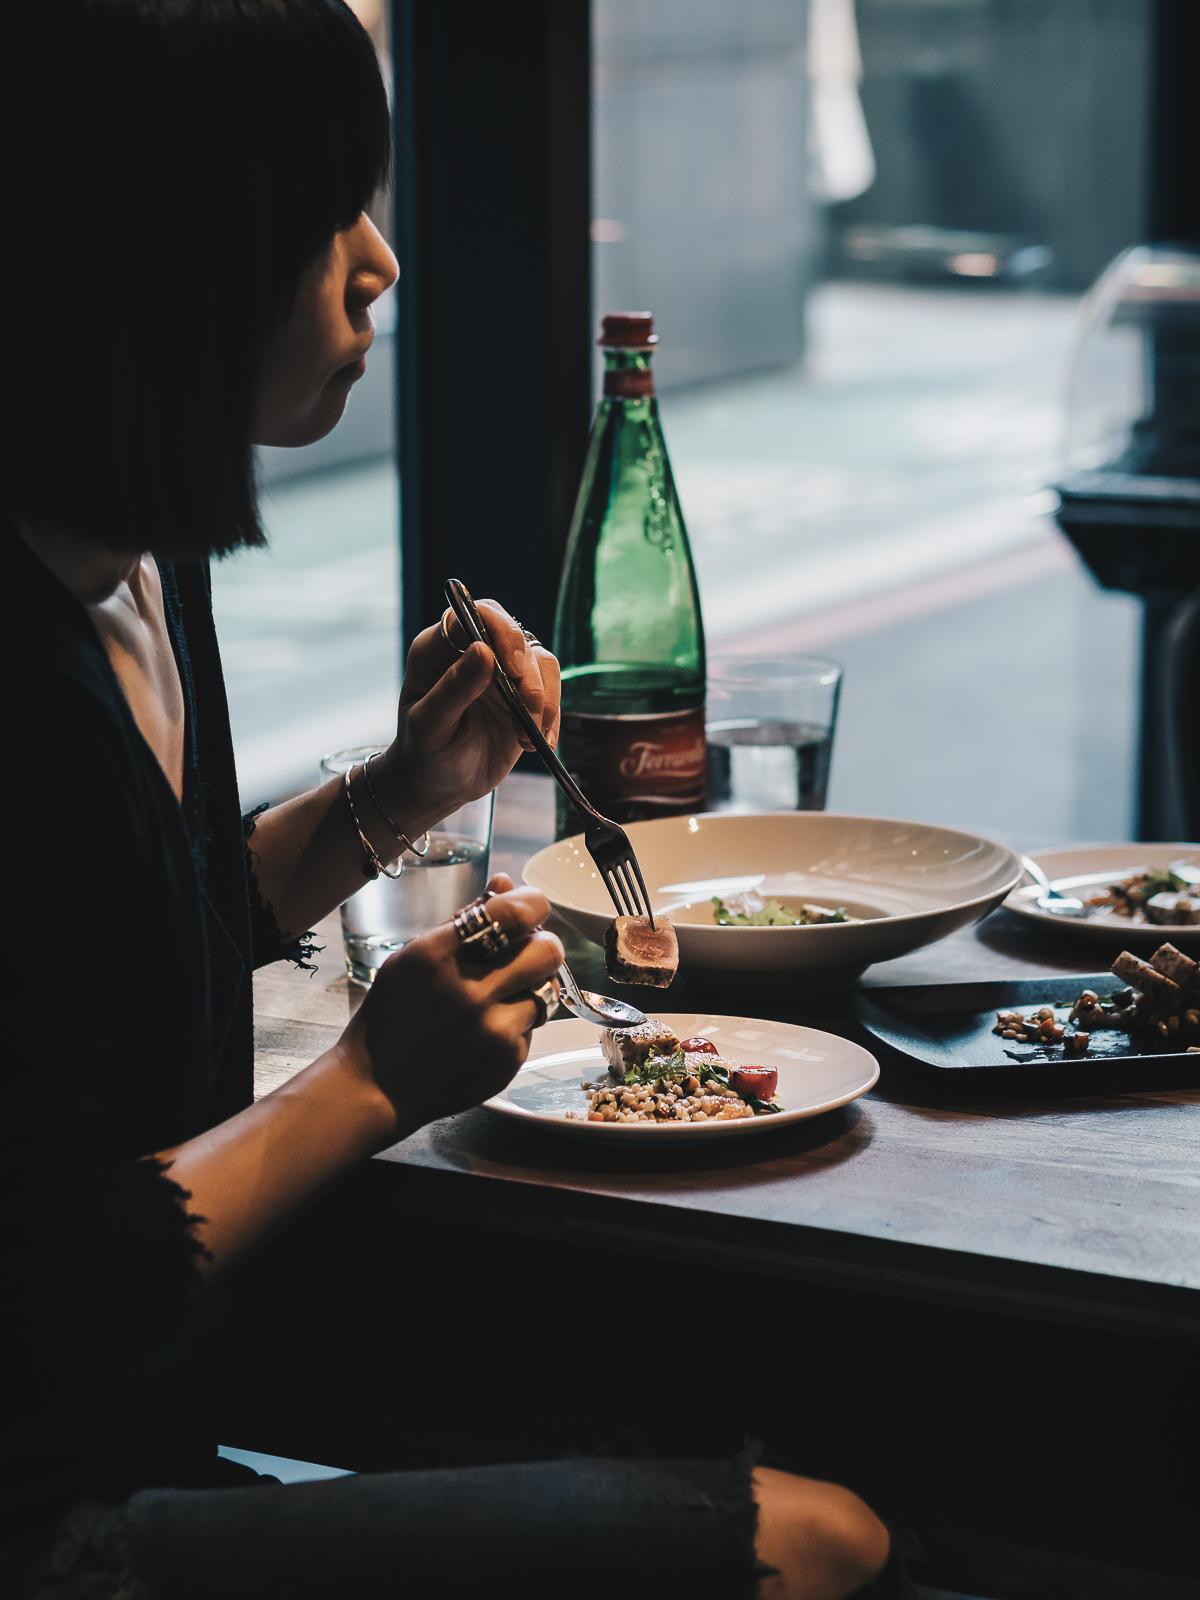 al sorriso Restaurant - Home Hotel DaAn Taipei - Olympus EM1Markii2512 - Yes! Please Enjoy-15.jpg